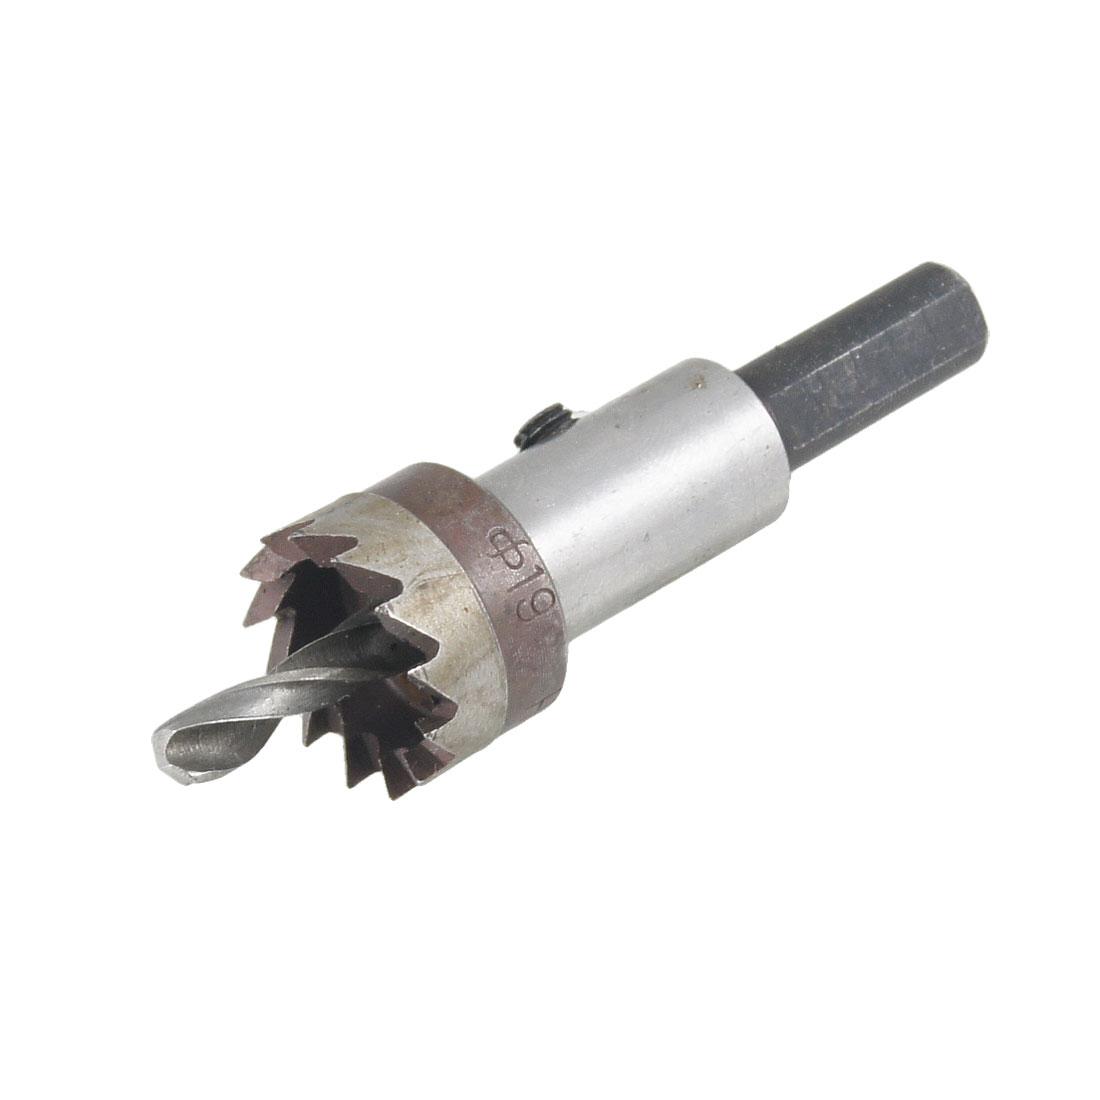 7.5mm Triangle Shank Twist Drilling Bit Iron Cutting 19mm Dia Hole Saw